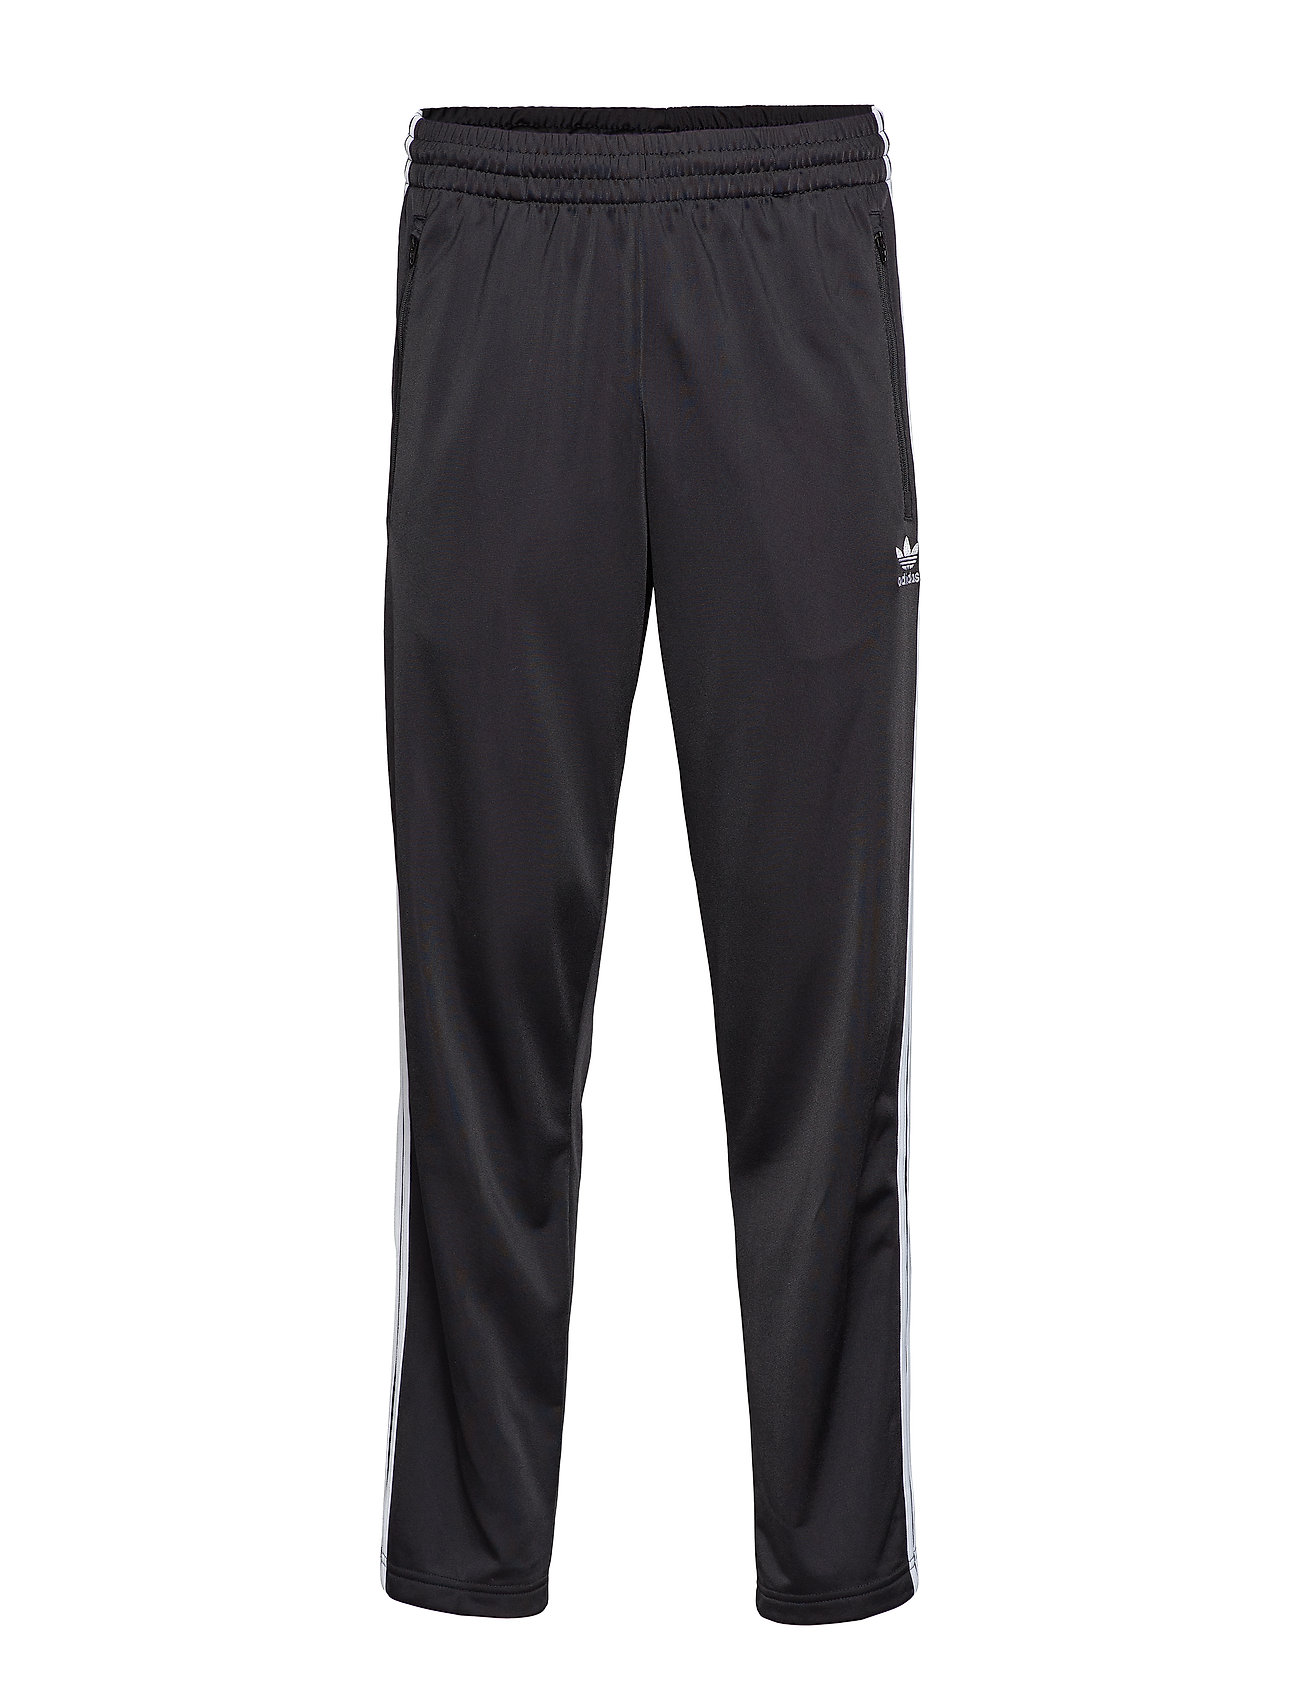 adidas Originals FIREBIRD TP - BLACK